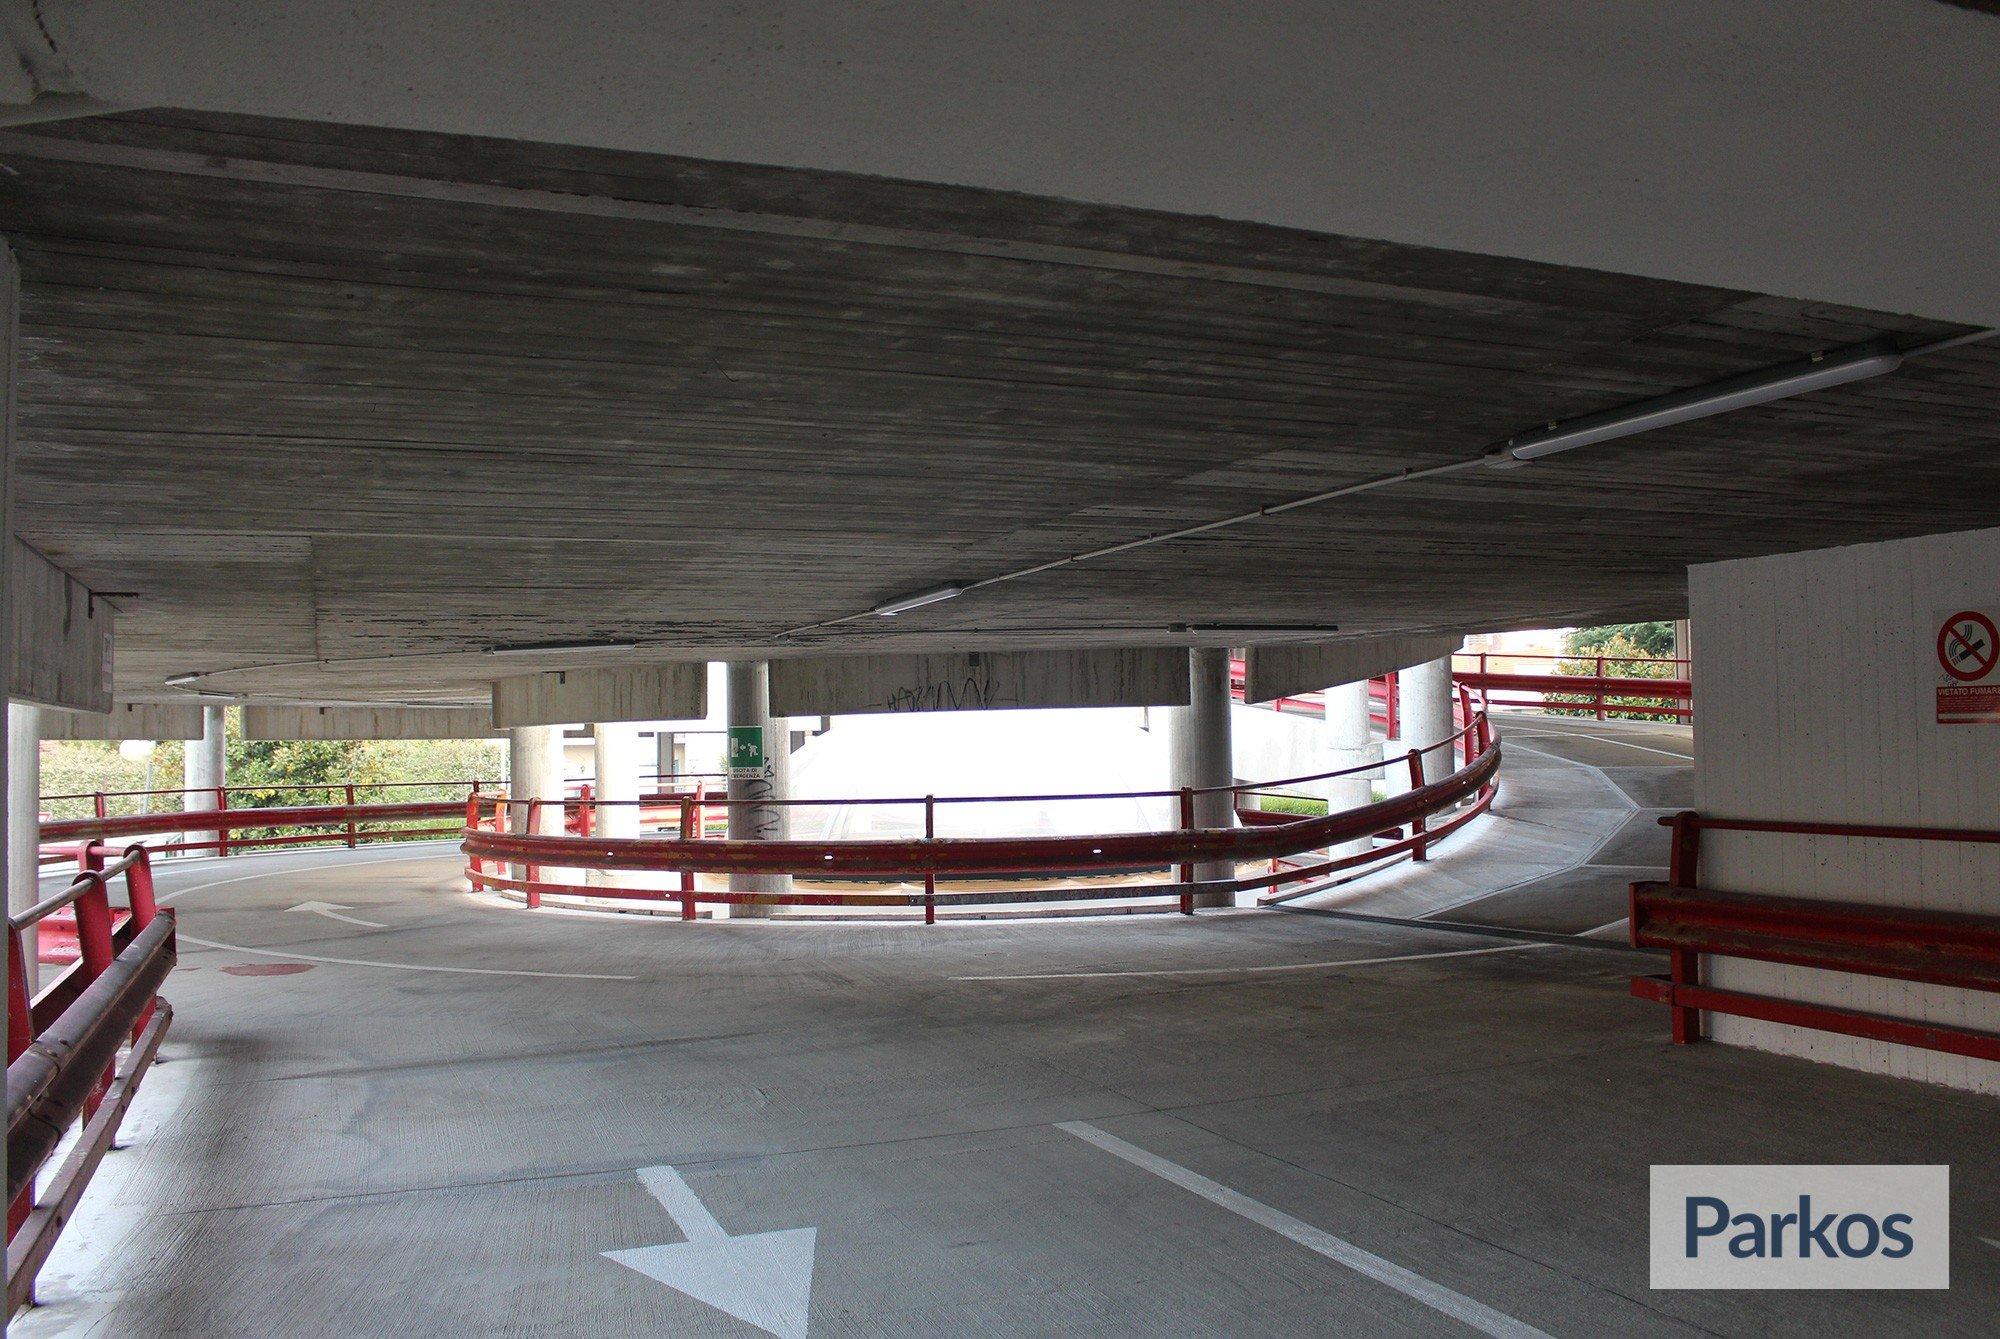 Sala Fumatori Aeroporto Palermo : Le torri parking trova parcheggio sicuro